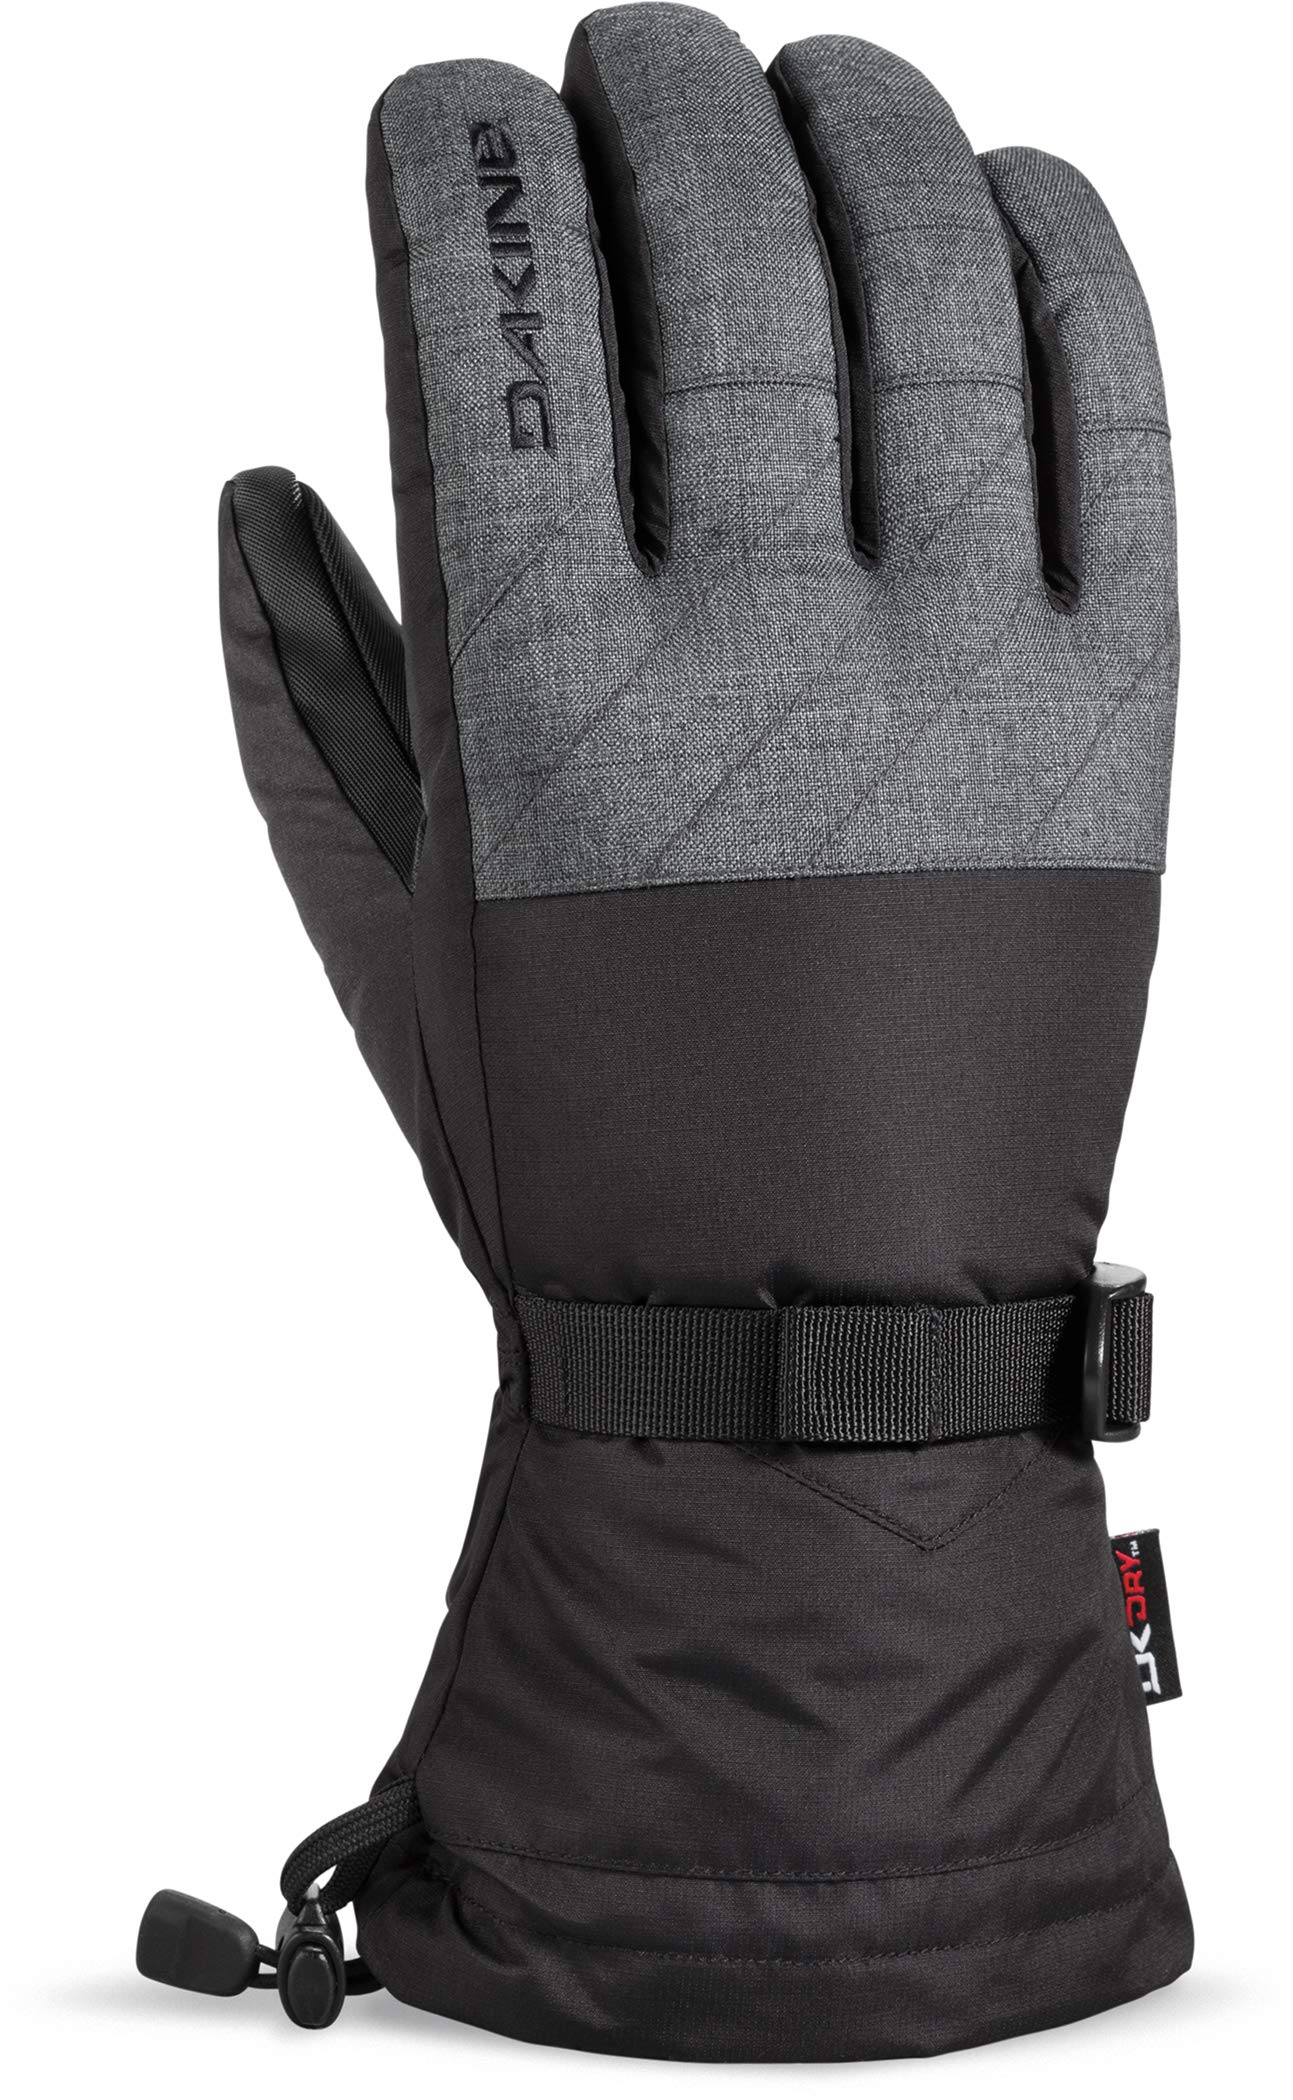 Dakine Men's Talon Glove, Carbon, XL by Dakine